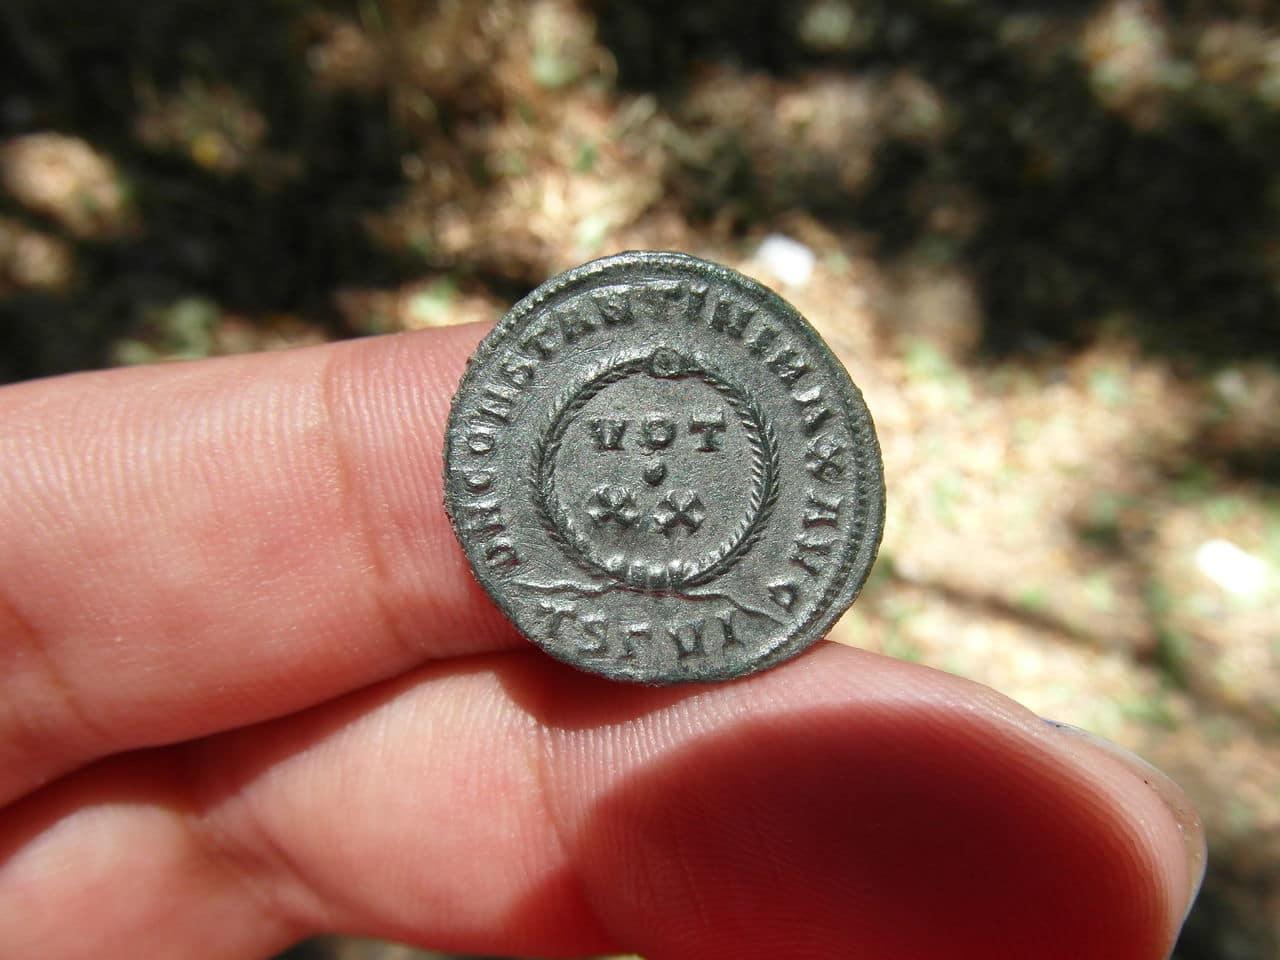 AE3 de Constantino I. DN CONSTANTINI MAX AVG /  VOT XX. Tesalonica RH715_D2